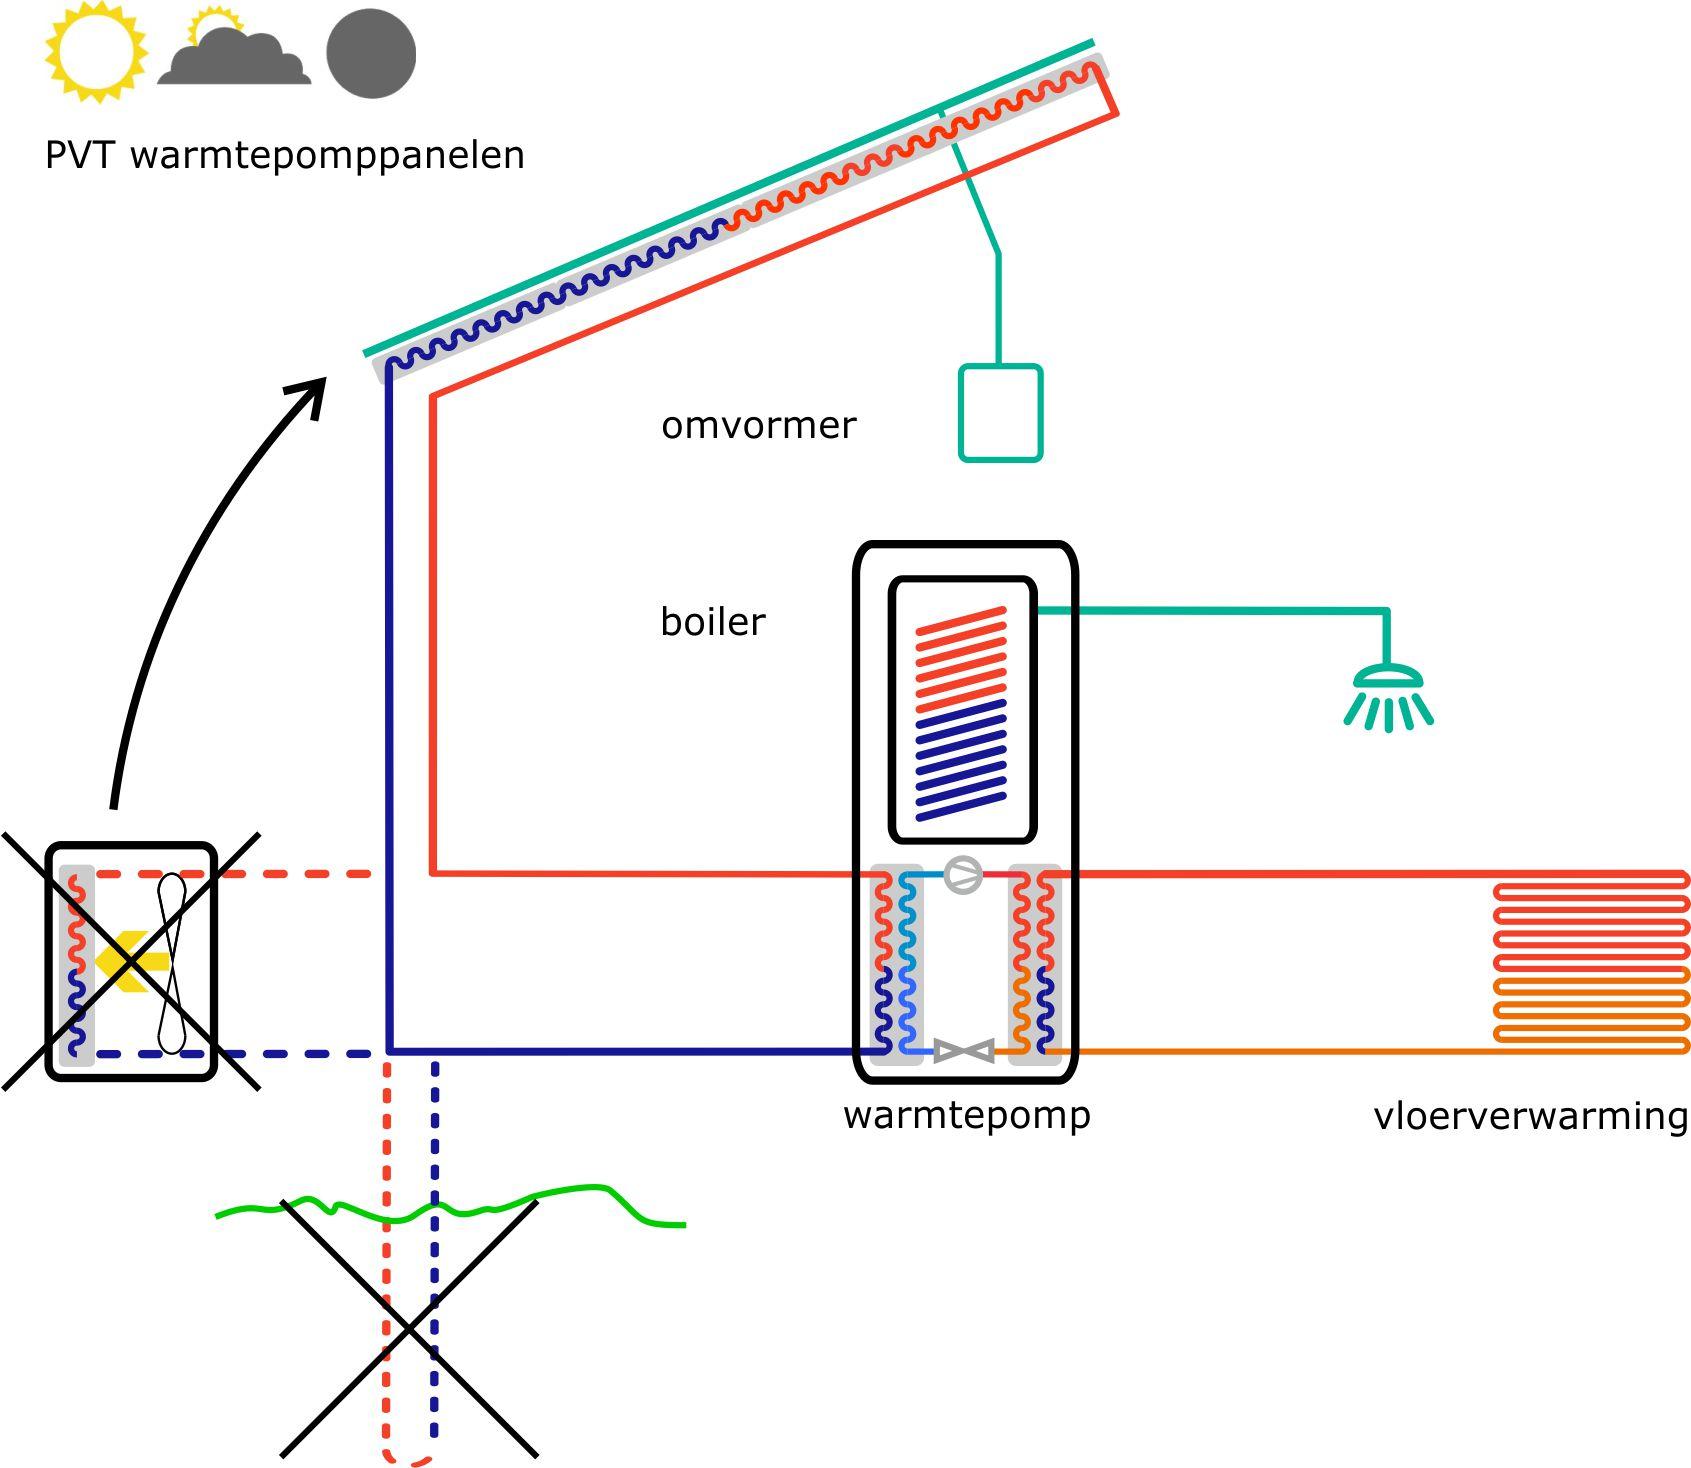 Triple Solar warmtepomp 3 varianten 2018